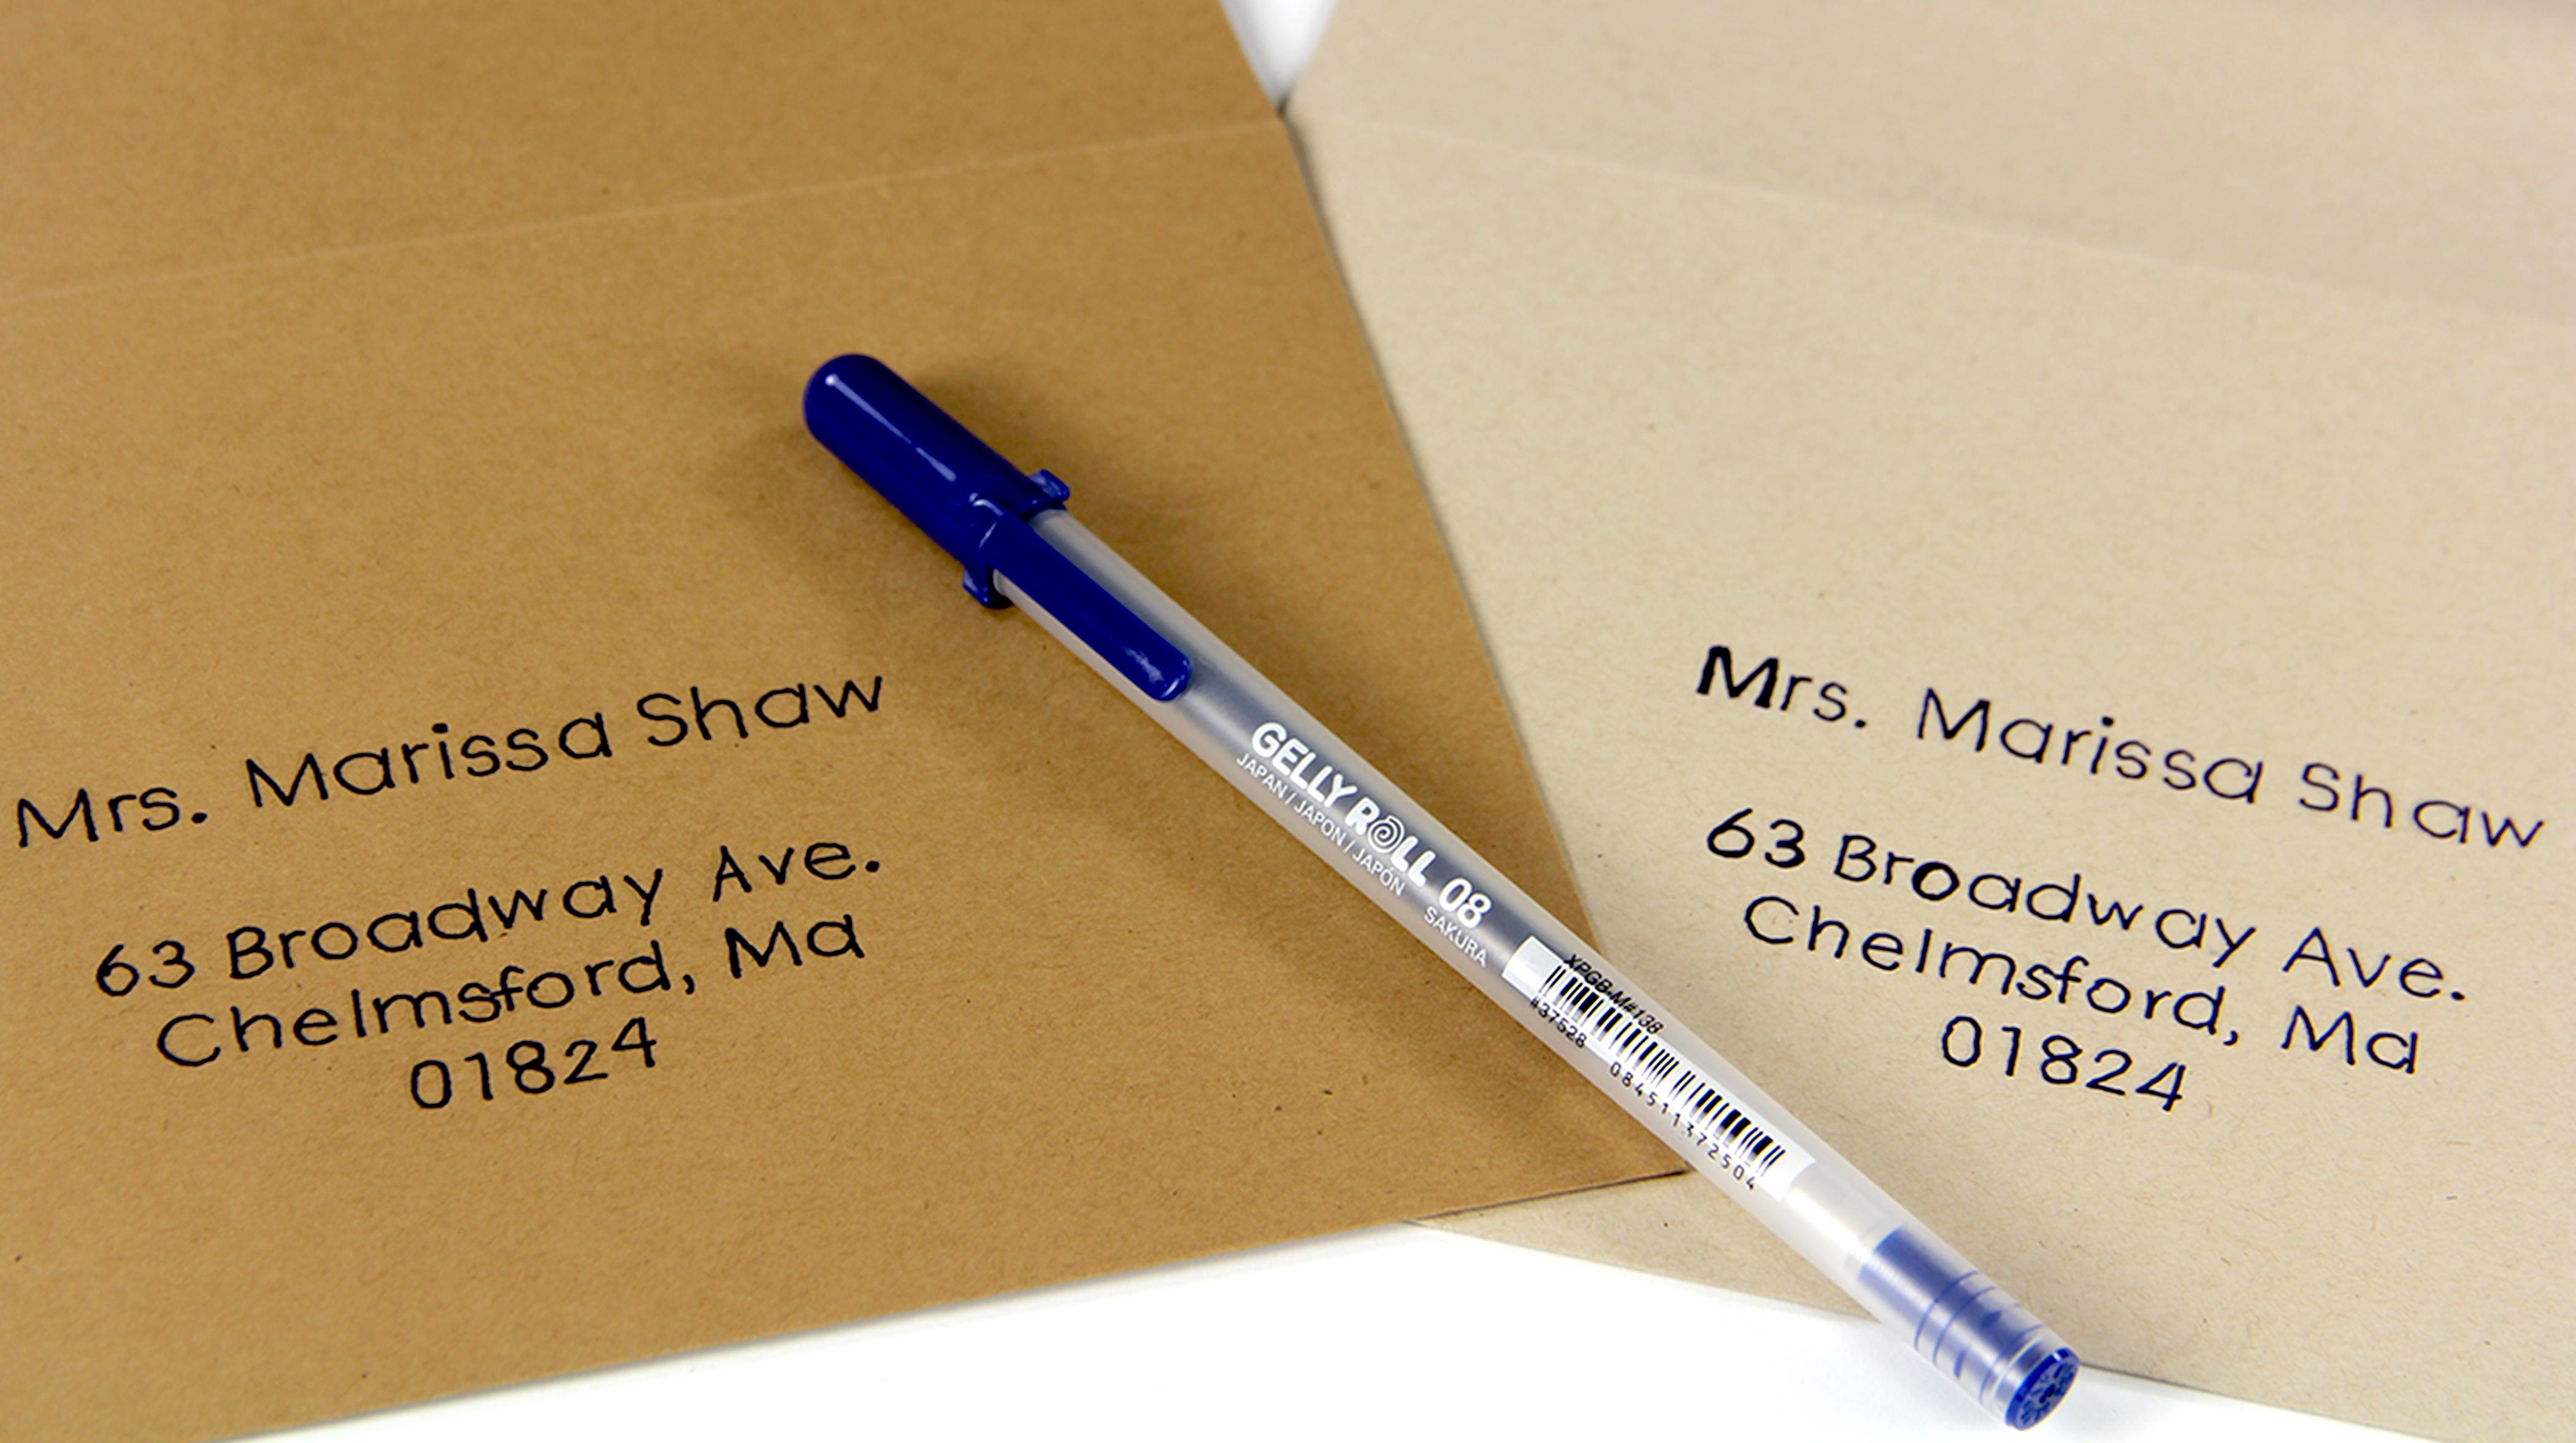 Neenah Environment Kraft Paper Envelopes Hand Written With Gel Pen